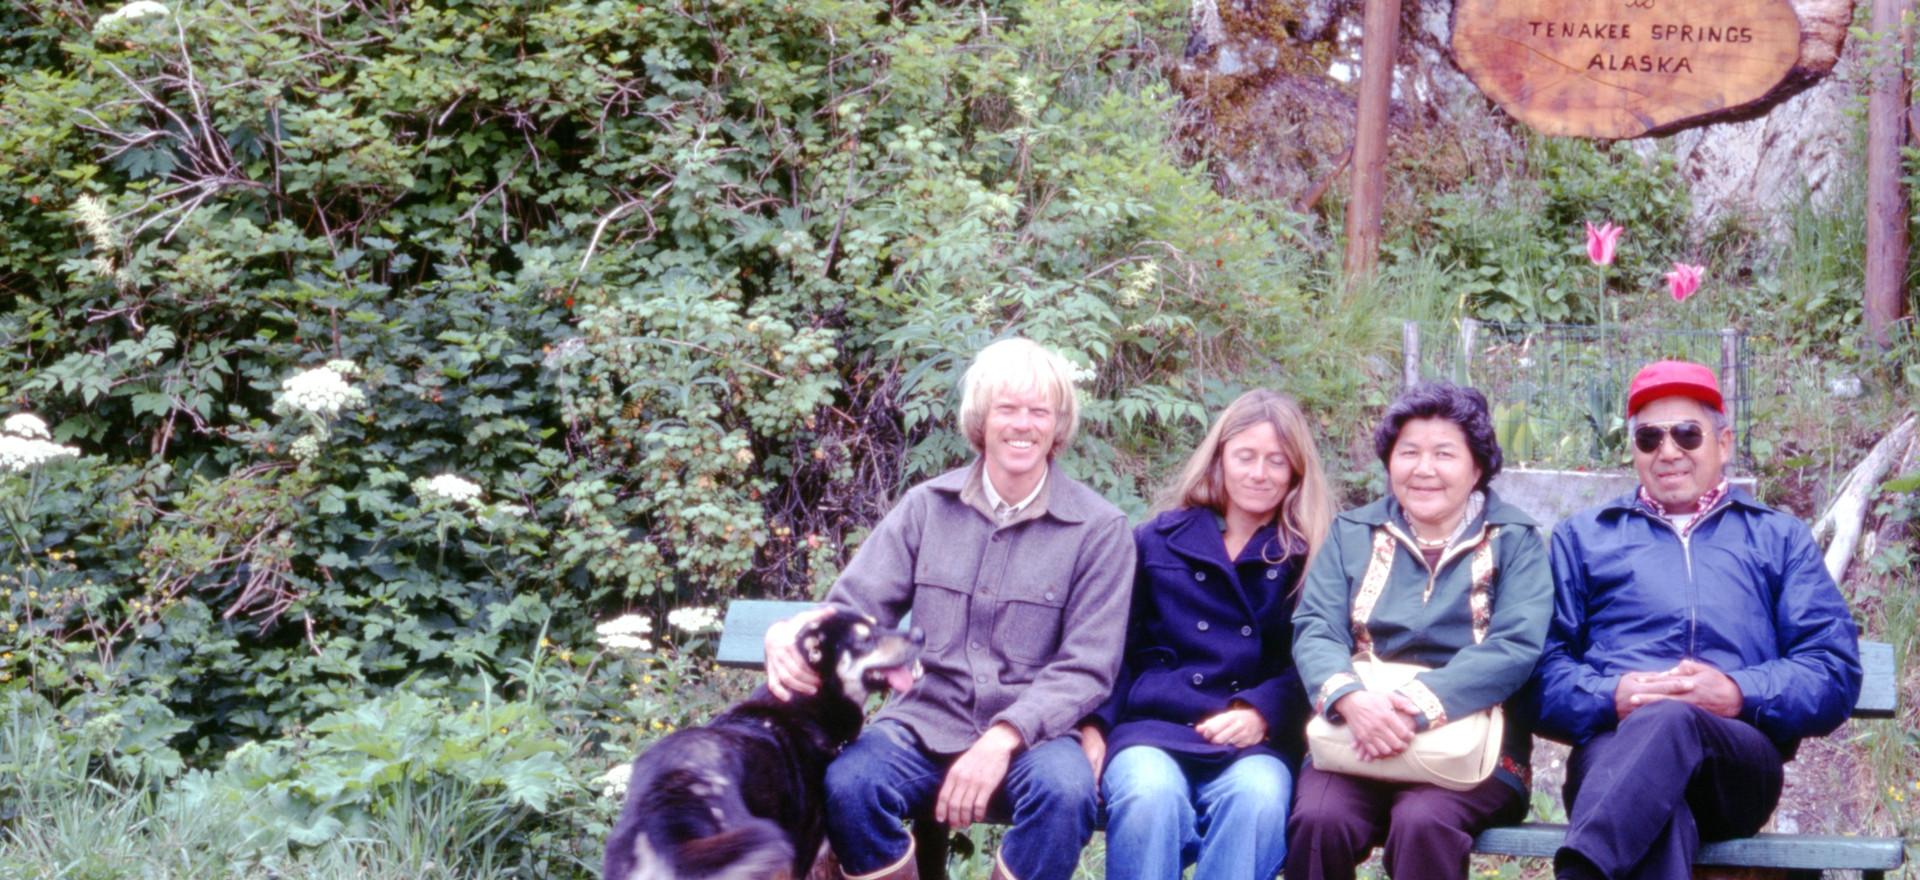 Catherine and Steven Attla visiting Richard and Kathy in Tenakee, Alaska.